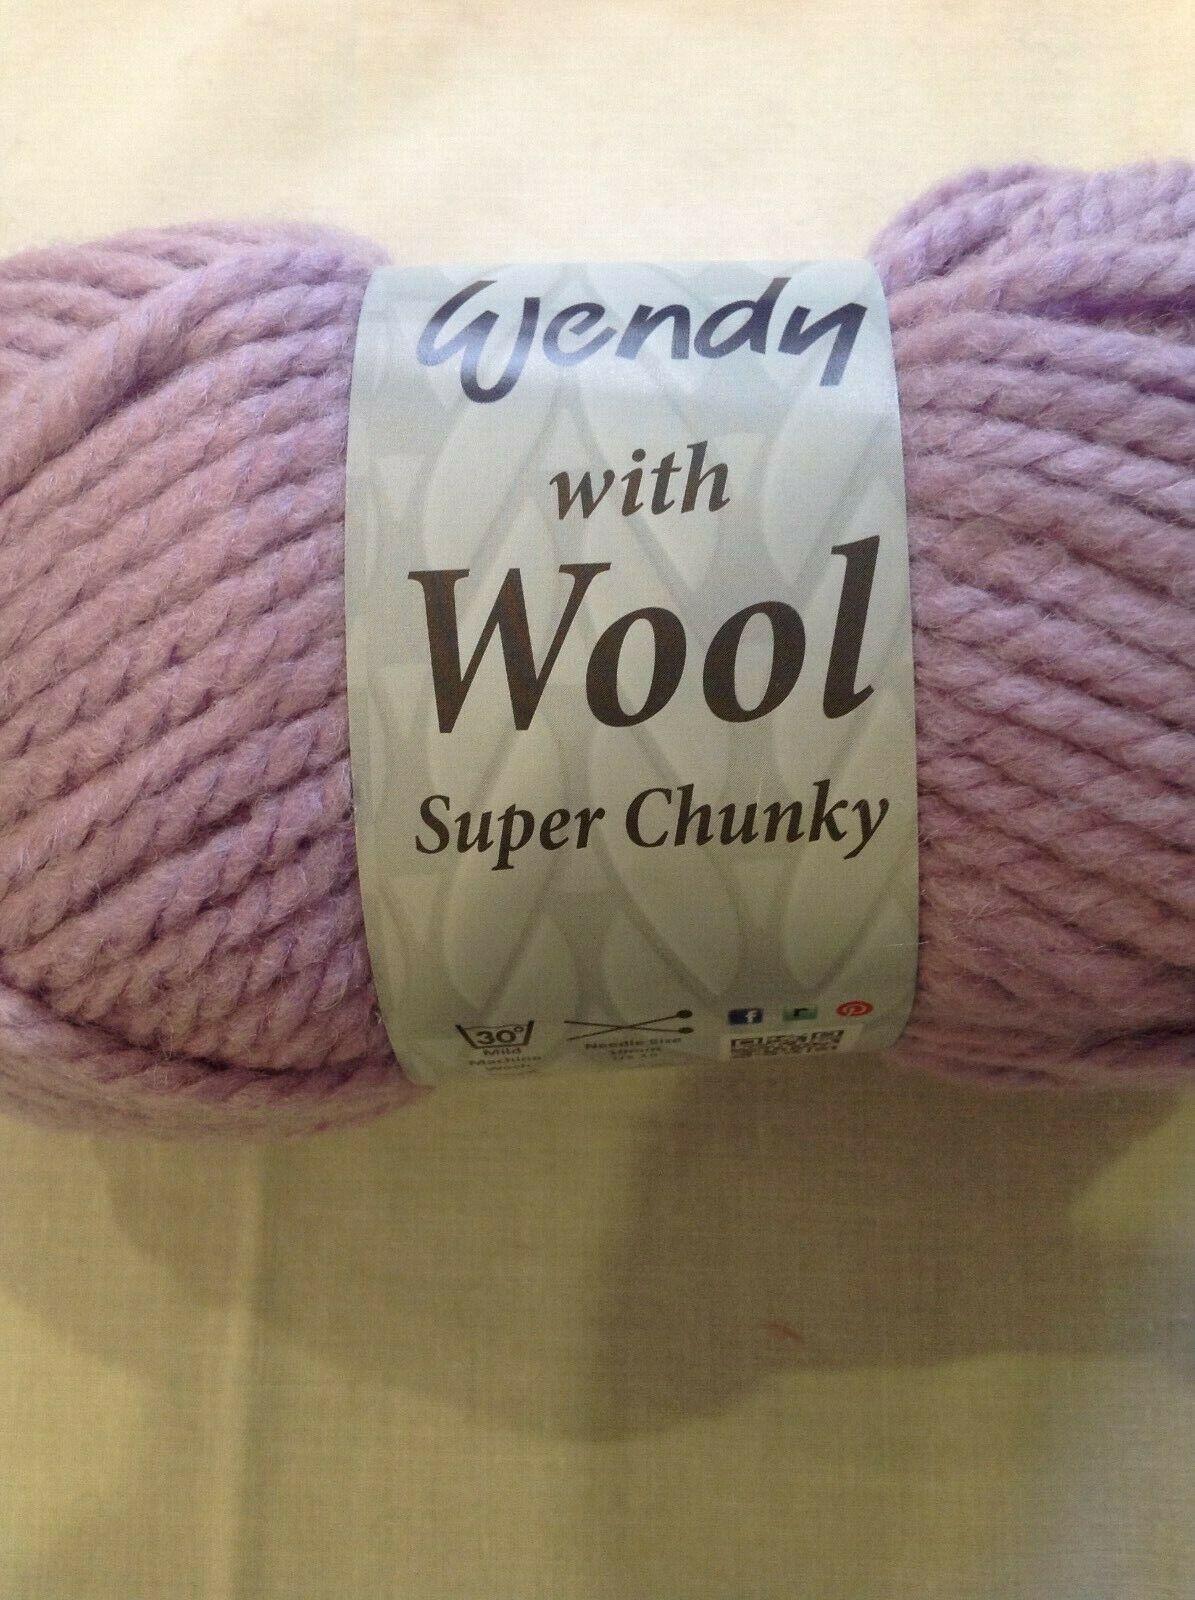 WENDY LOVE IT LATEST YARN FROM WENDY 5X100 GRAM BALLS Purple